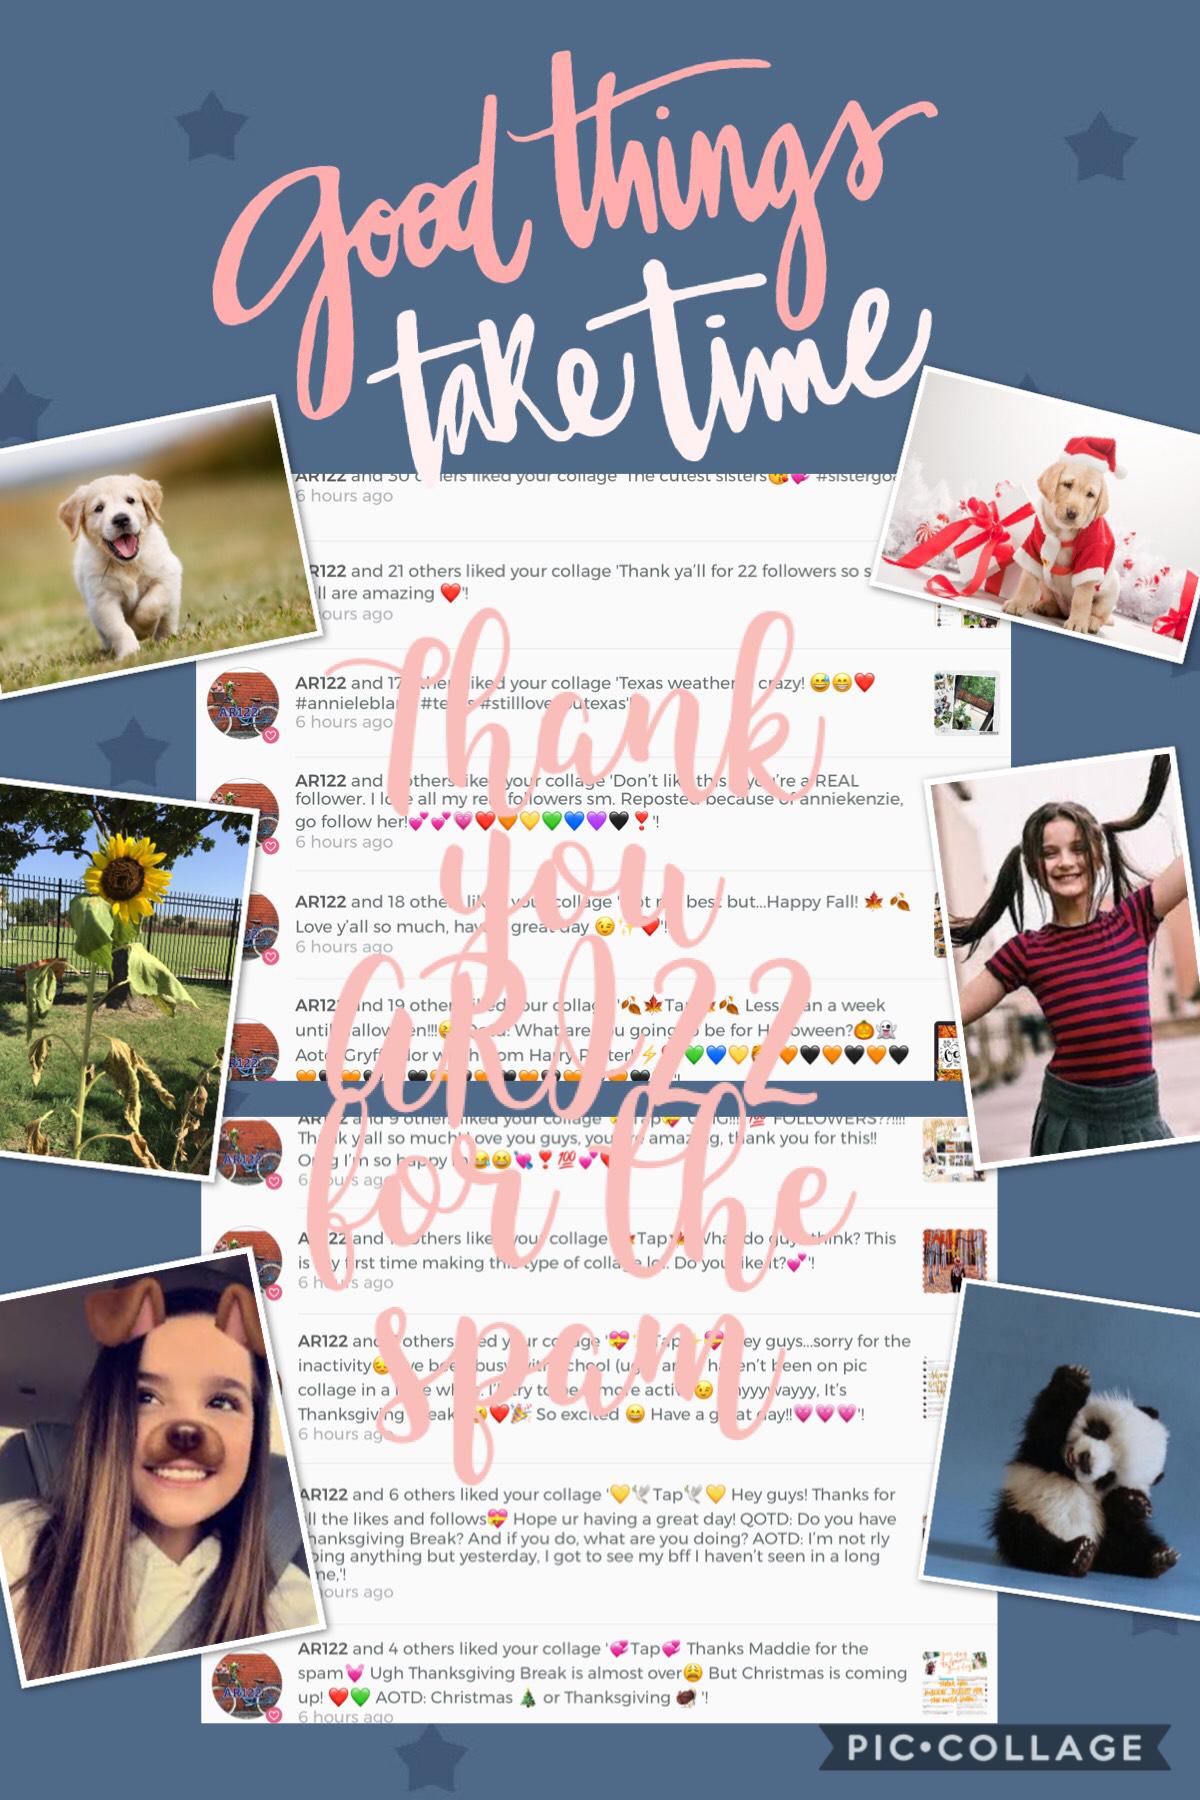 💗Tap💗 Thanks ARI22 for the spam 😊❤️How r y'all doin? 😁🥰QOTD: Fav Celebrity? AOTD: Y'all know the answer😂 ANNIE LEBLANC❤️👑❤️👑❤️ But I LUV Emma Watson too💗👑💗👑💗